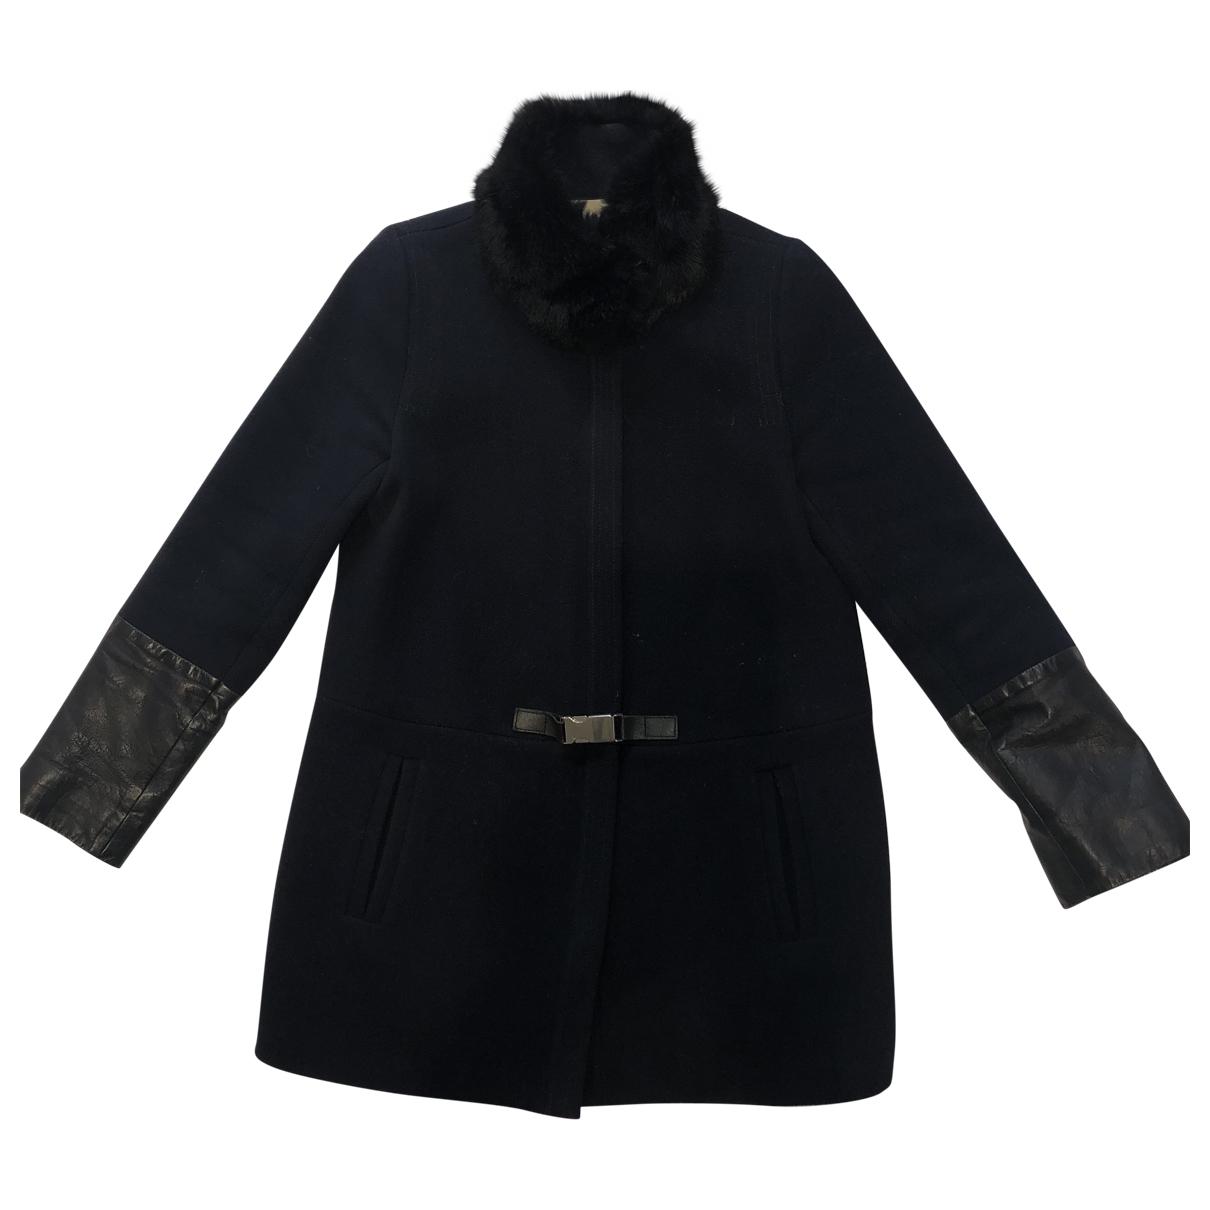 Claudie Pierlot \N Blue Wool coat for Women 36 FR